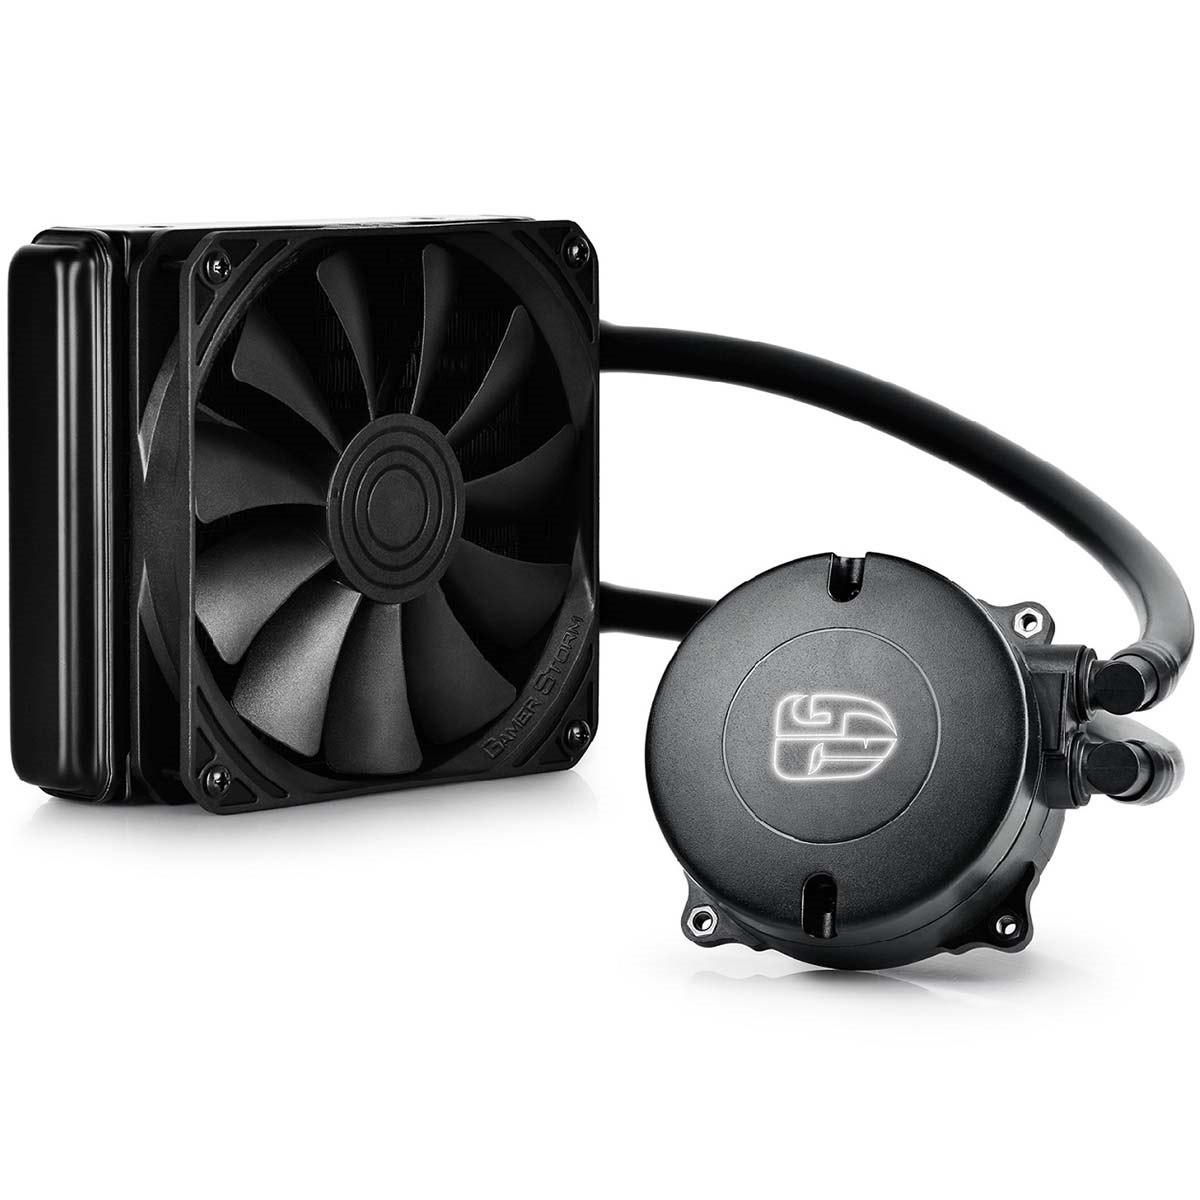 Deepcool Gamer Storm Maelstrom 120K Aio Liquid Cooling Intel/AM4 (Fits HTPC Cases)